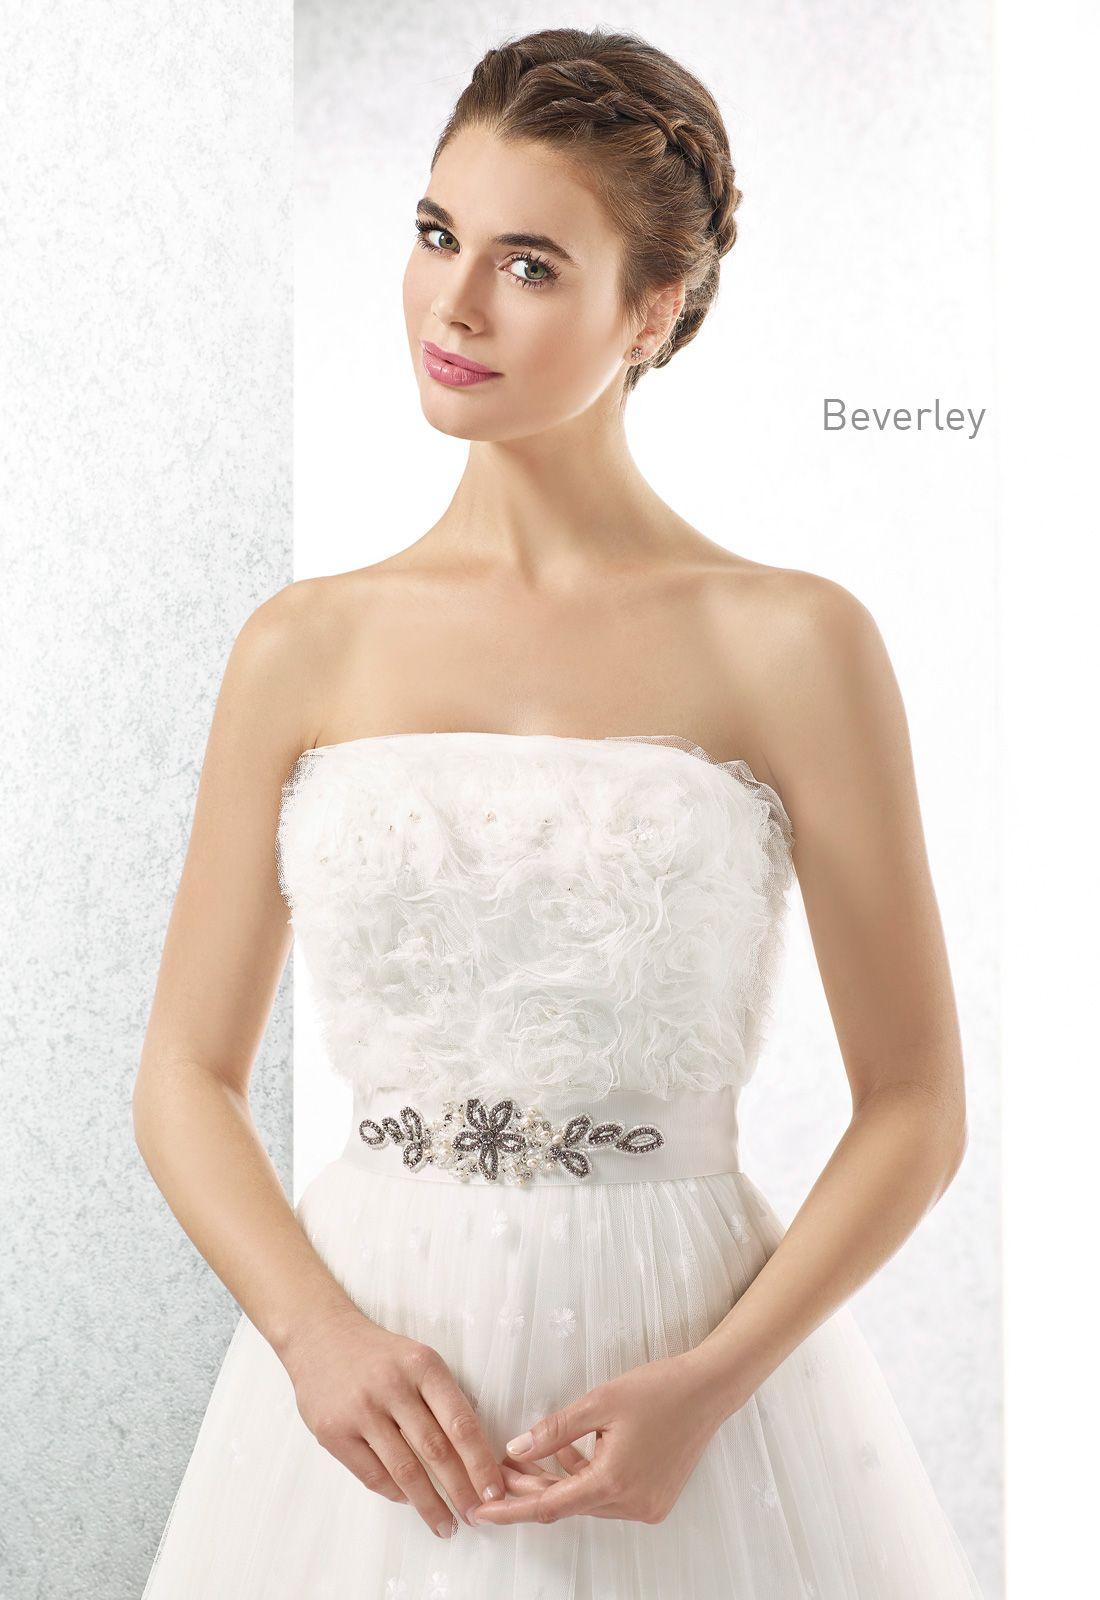 BEVERLEY wedding dress Cabotine   hair style   Pinterest   Wedding ...